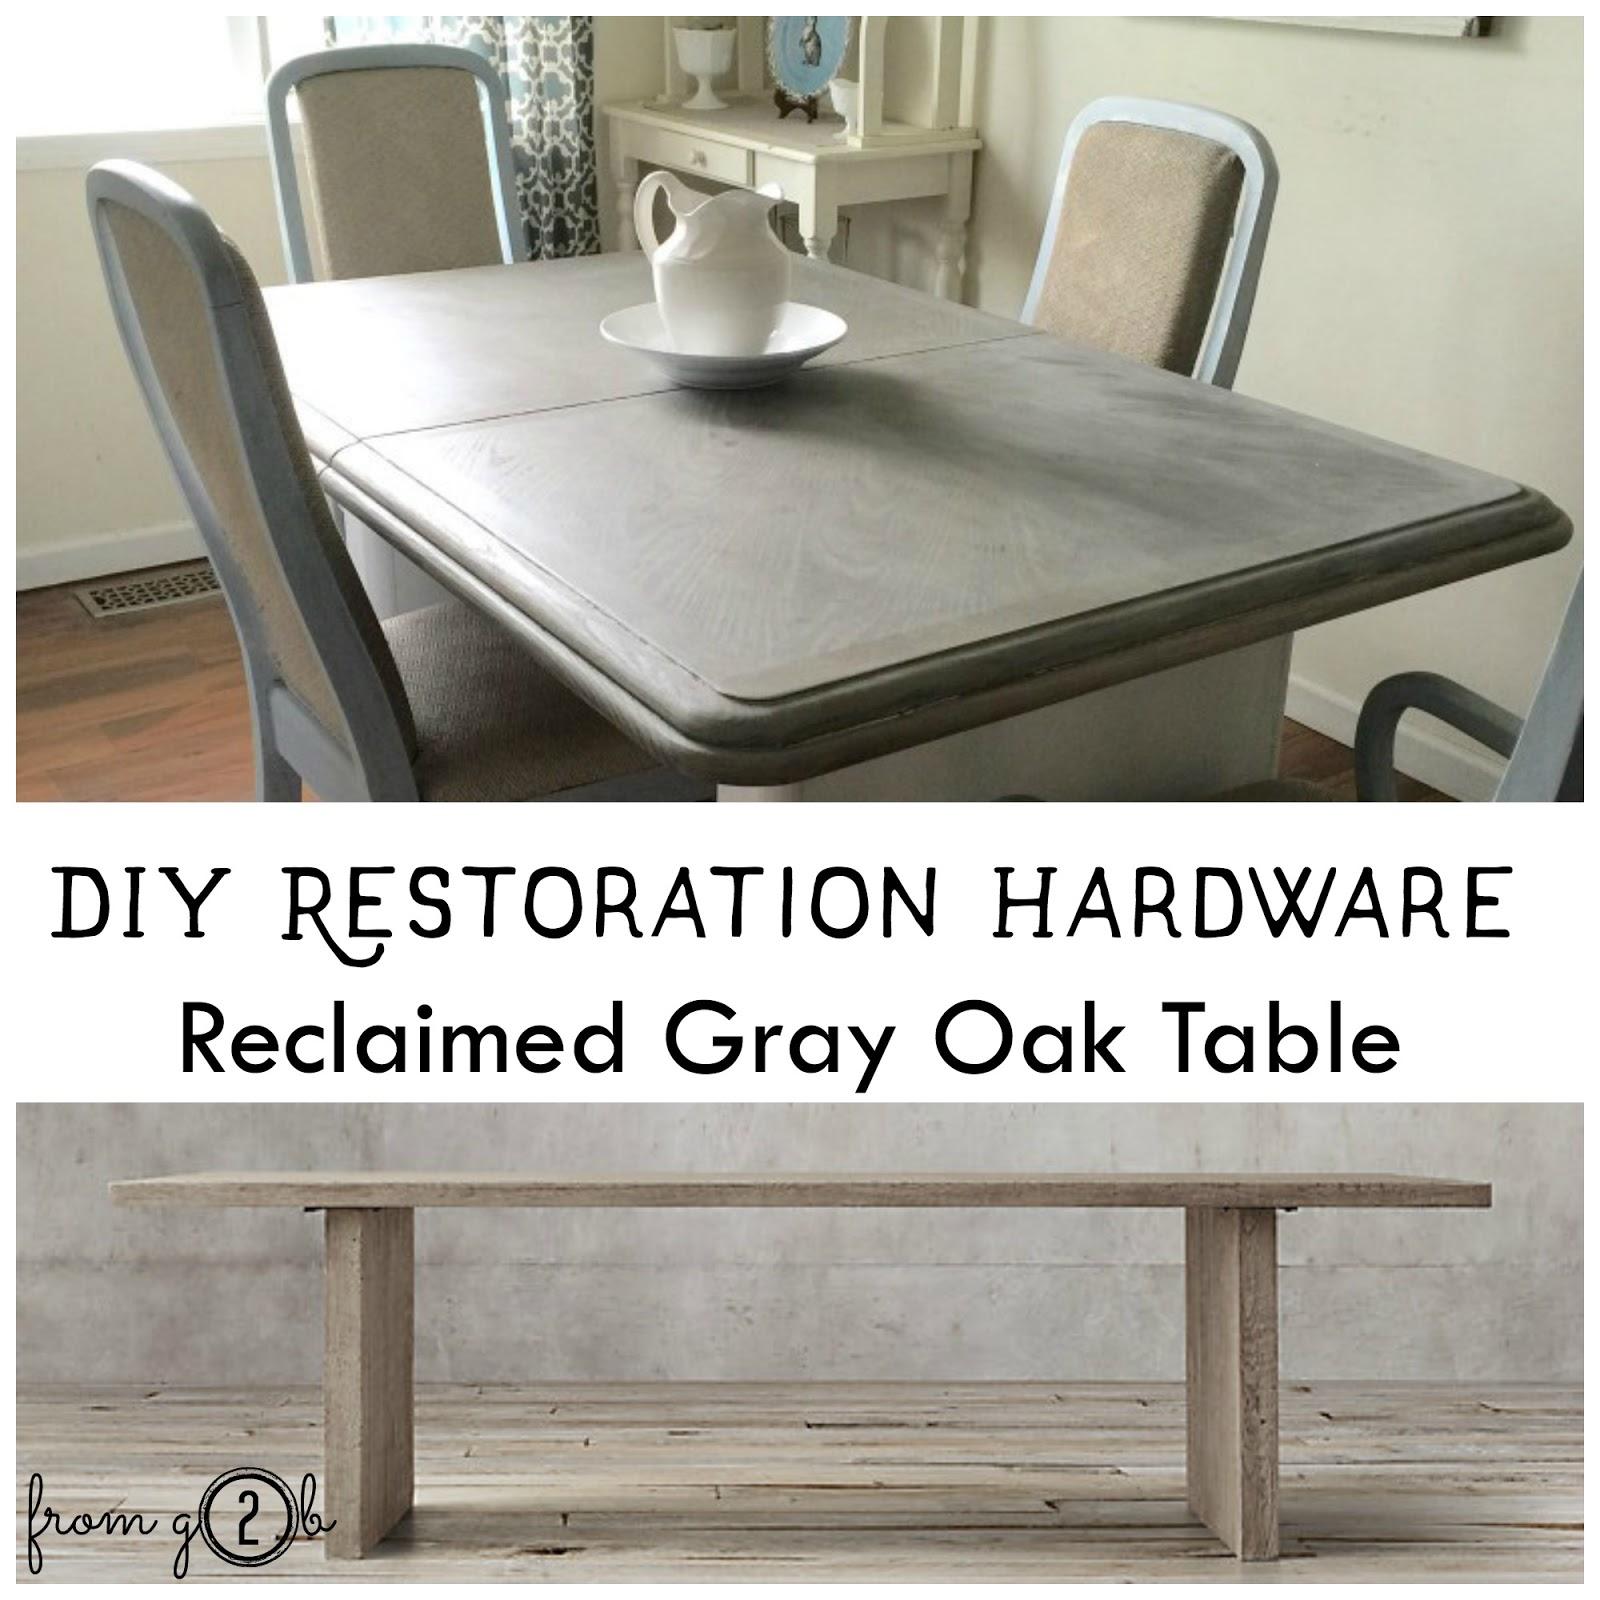 from Gardners 2 Bergers DIY RH Reclaimed Gray Oak Table